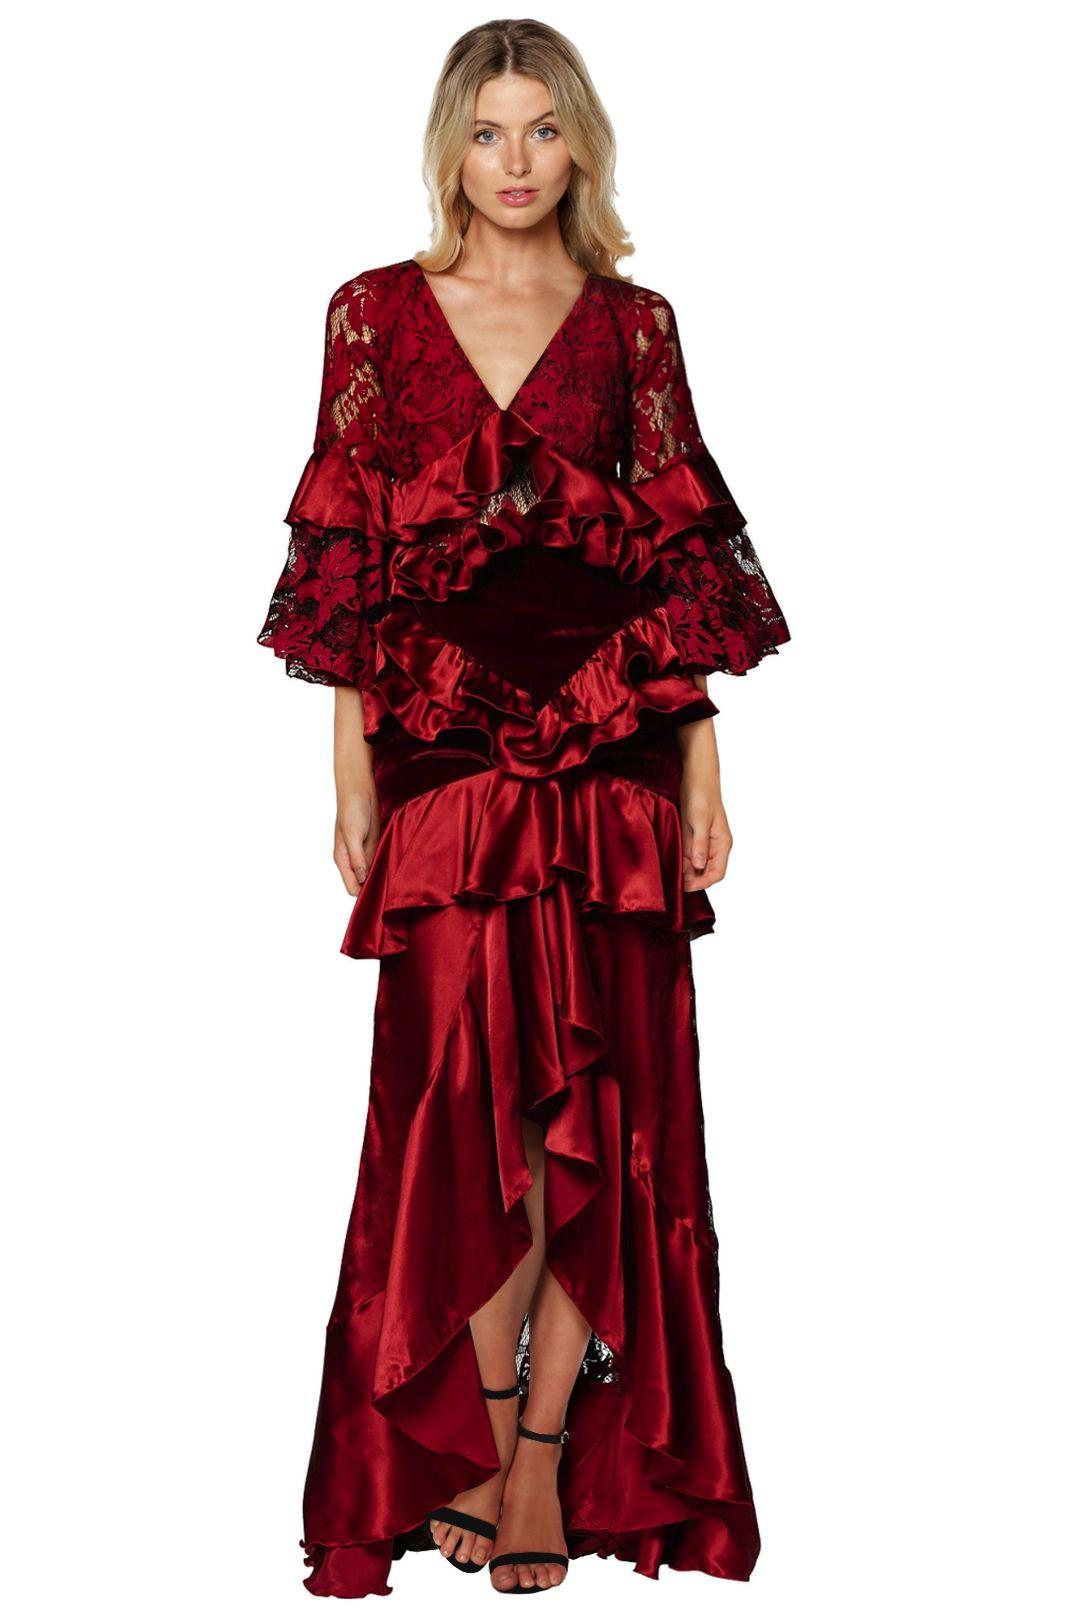 Romance Was Born - Crimson Magnolia Gown - Red - Front